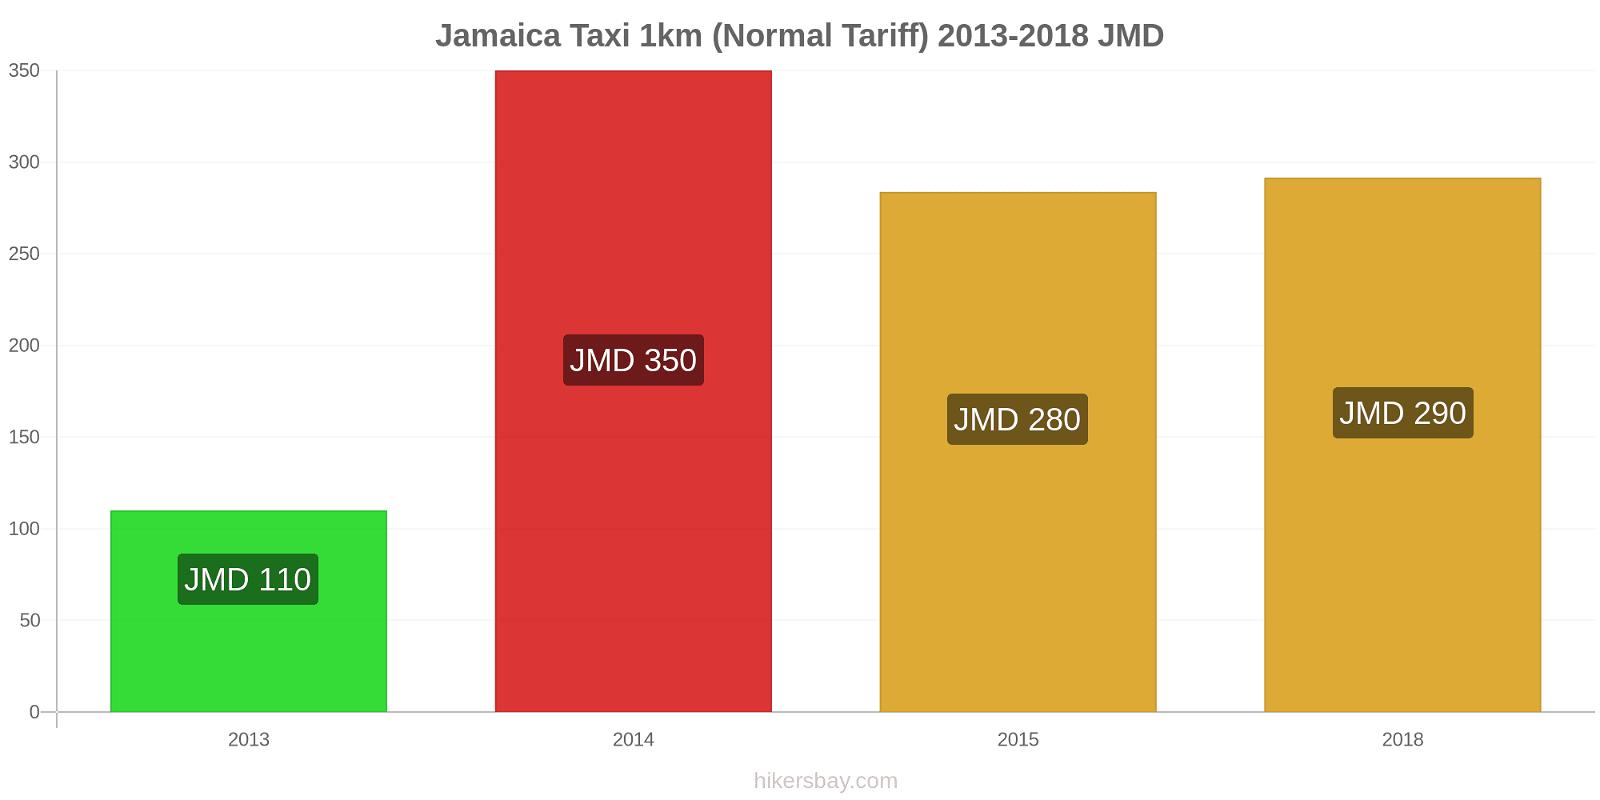 Jamaica price changes Taxi 1km (Normal Tariff) hikersbay.com